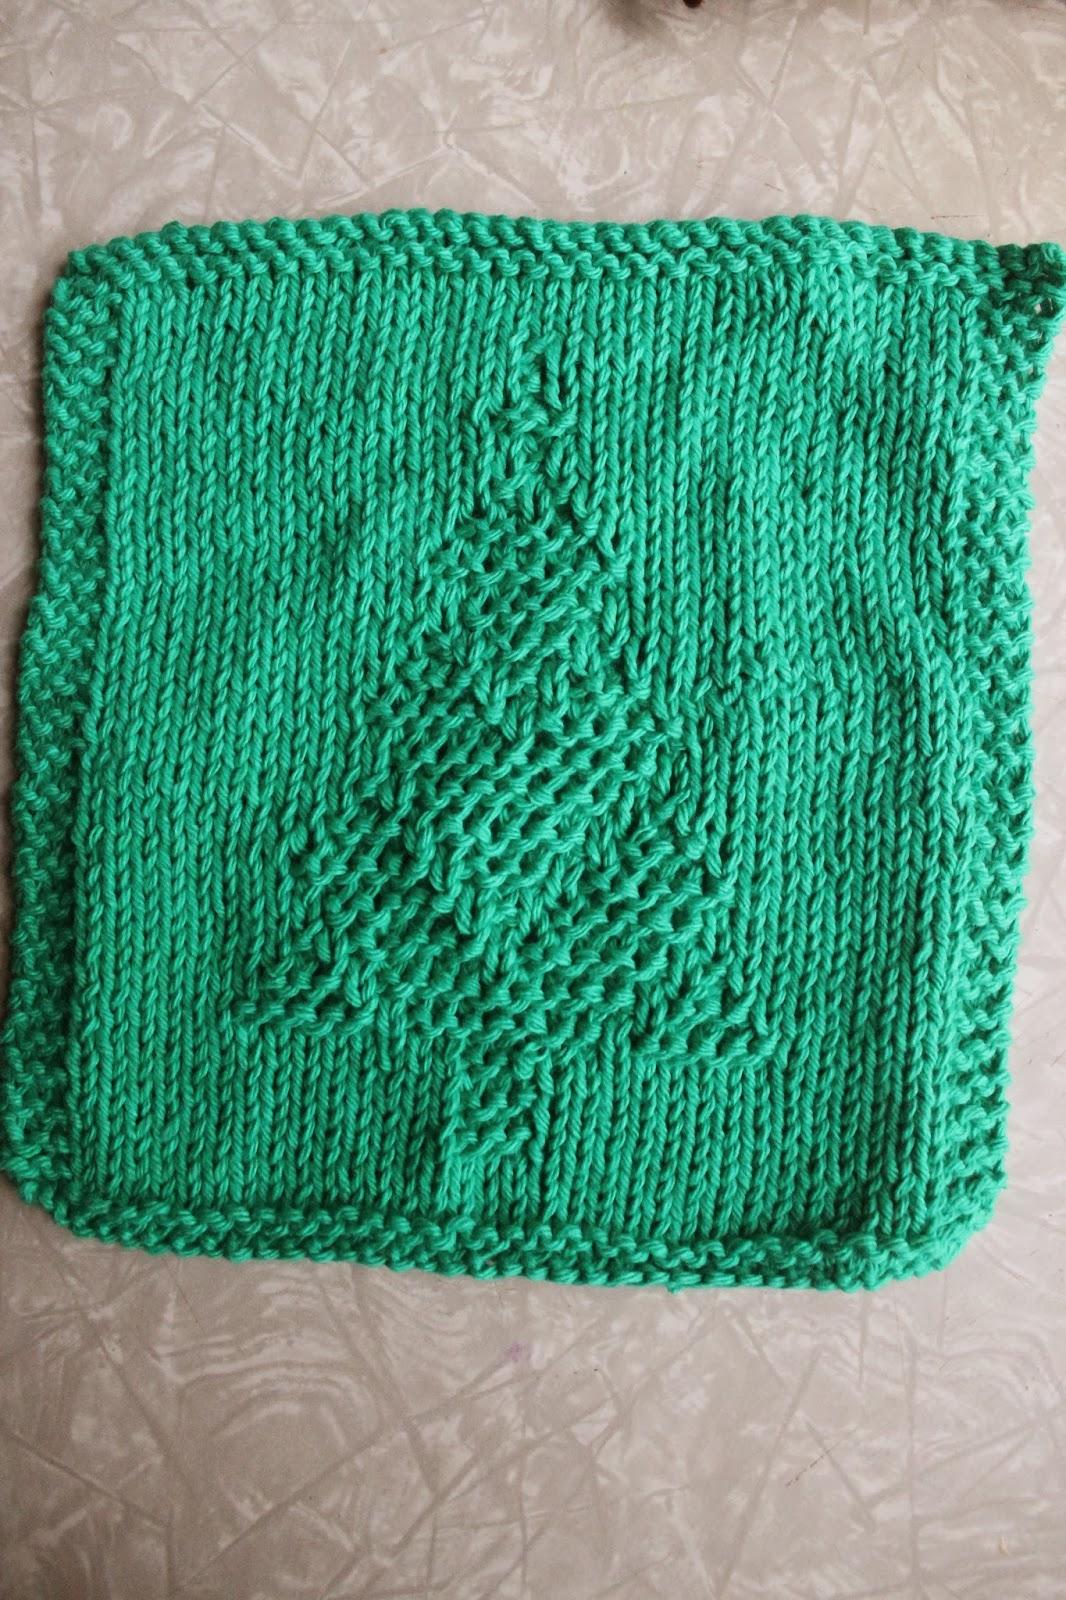 Knitting Pattern Dishcloth Christmas Tree : Everyday Life at Leisure: Weekly Dishcloth: Knitting the Christmas Tree Pattern